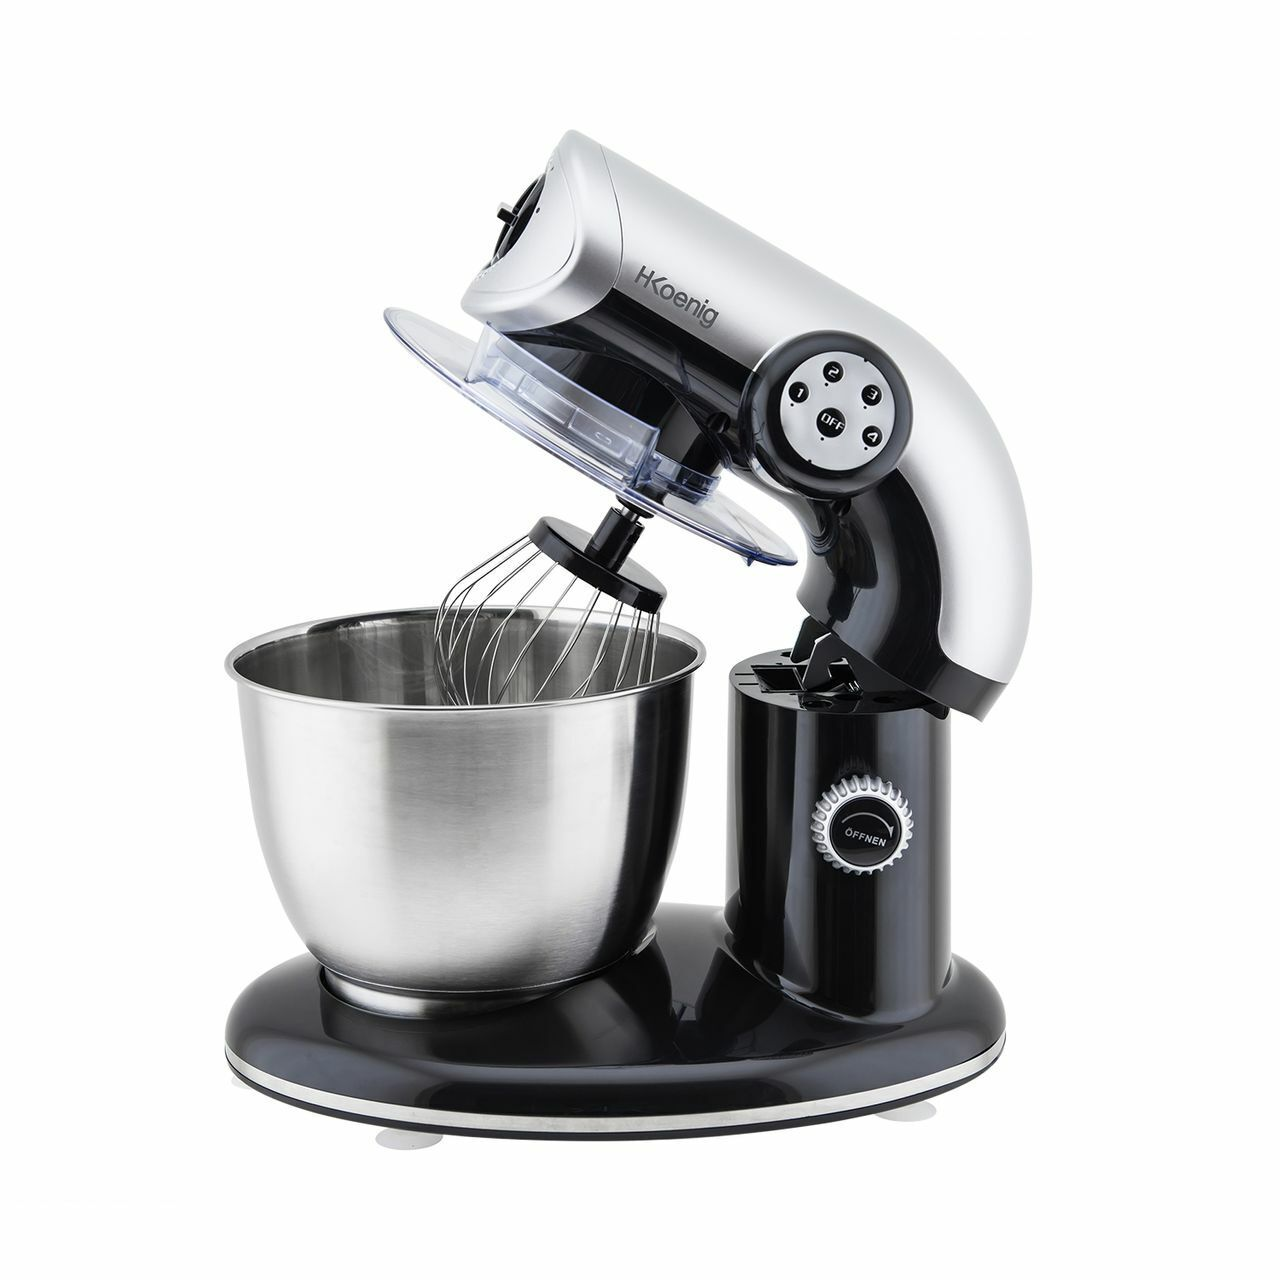 Premium Robot da Cucina Einarm Supporto Mixer 1000Watt Nero HKoenig KM80s